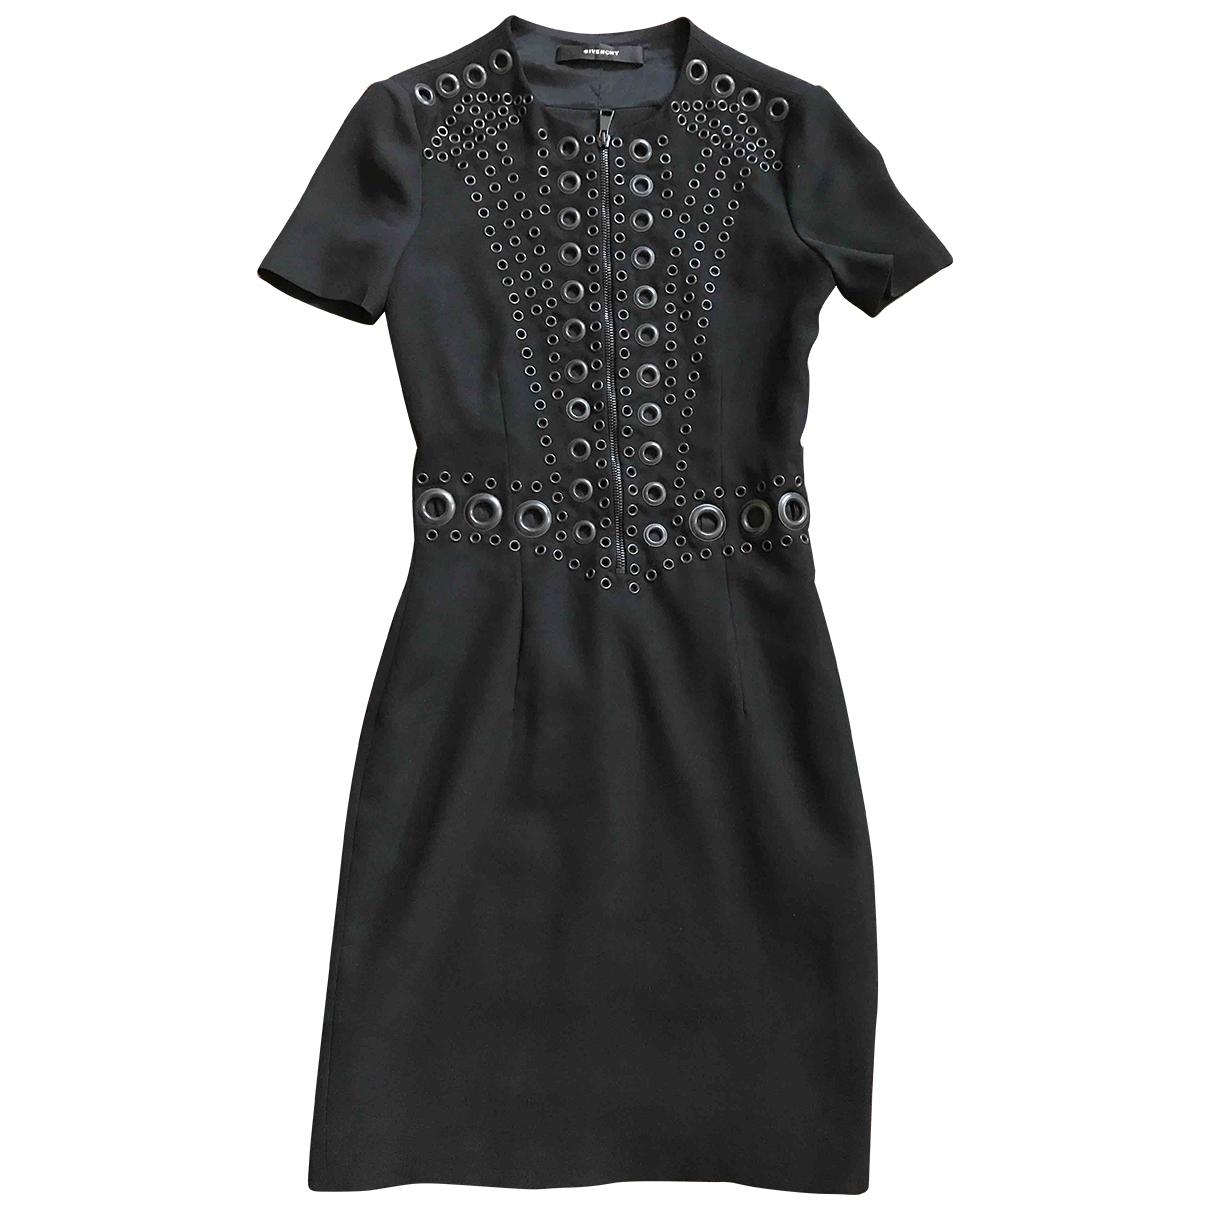 Givenchy \N Kleid in  Schwarz Polyester